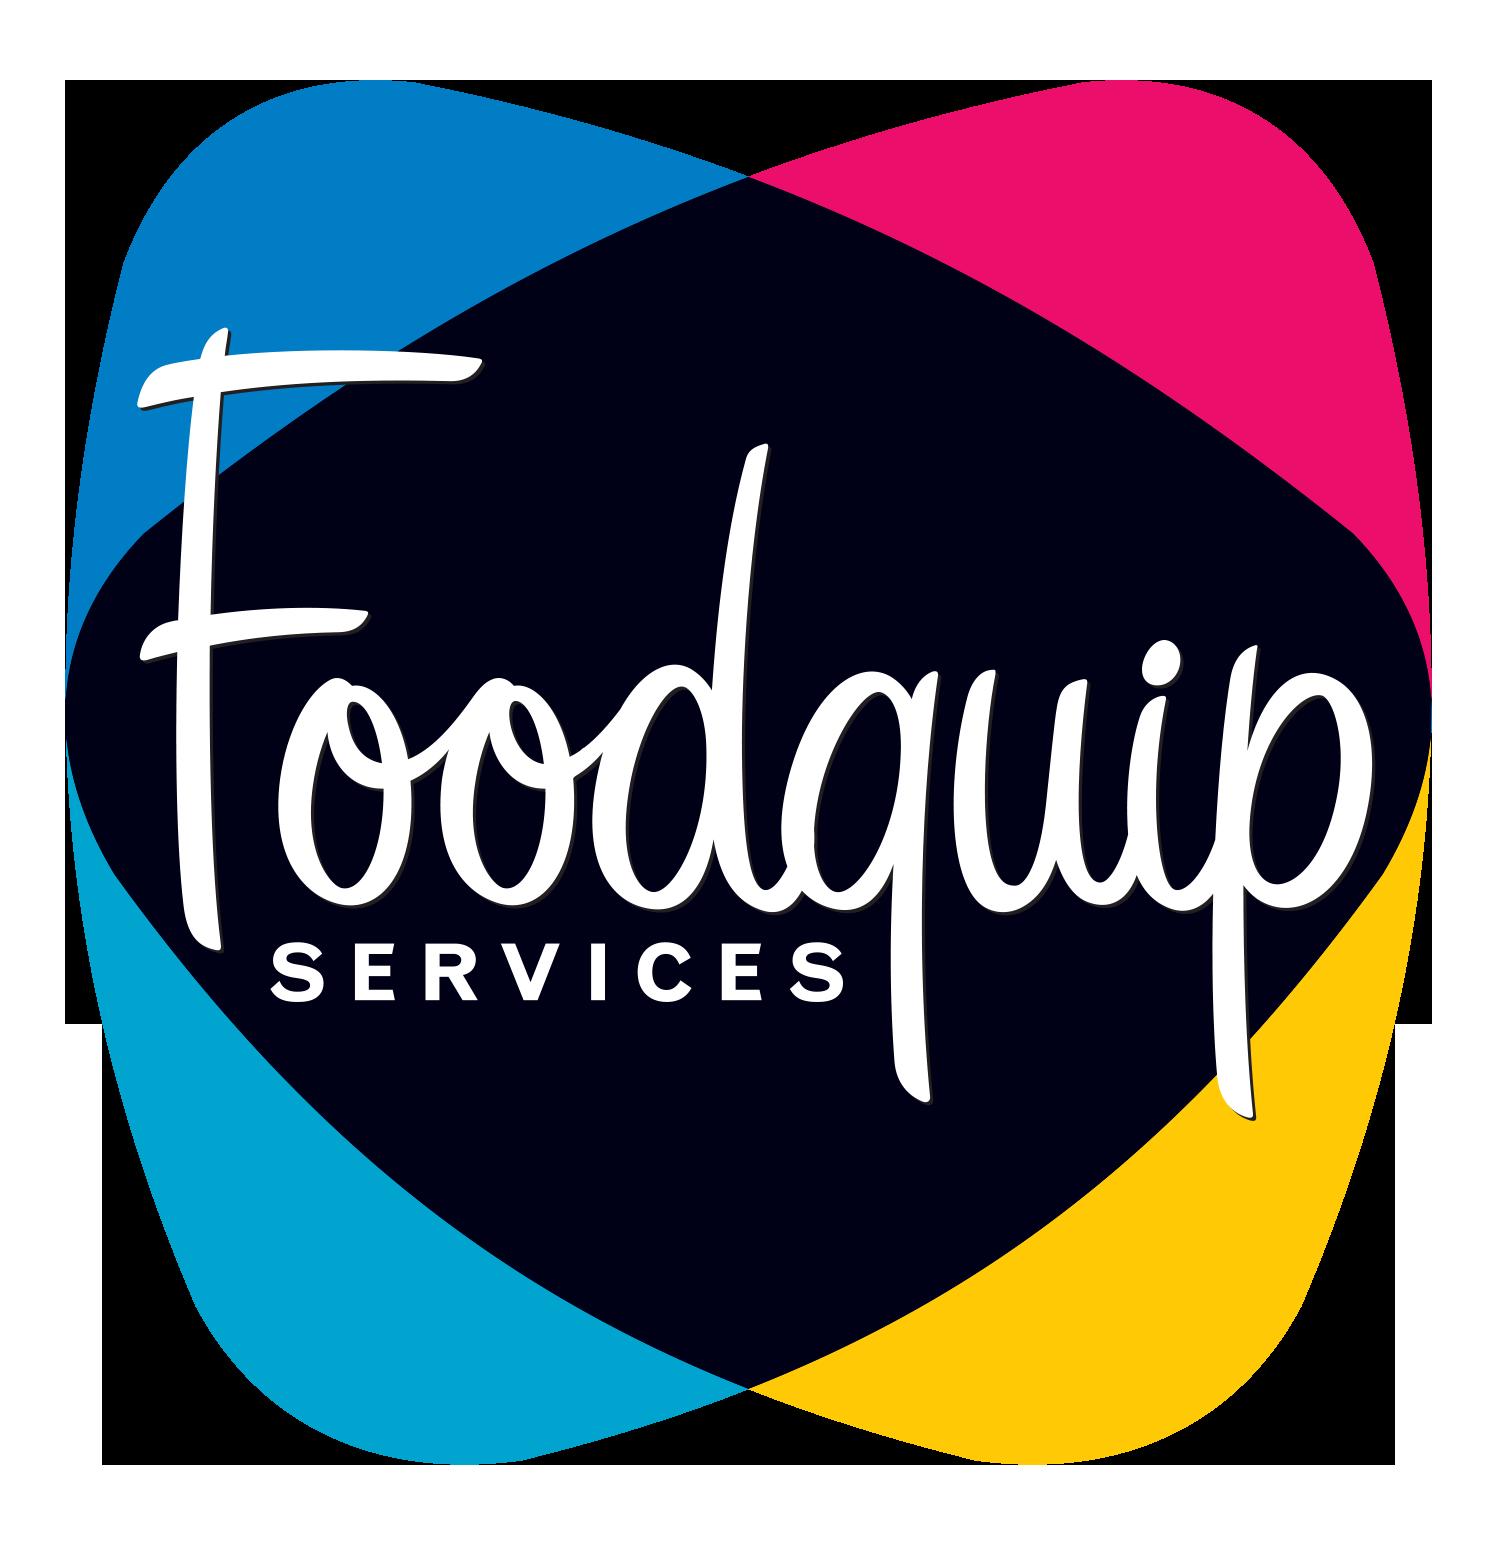 Foodquip Services logo